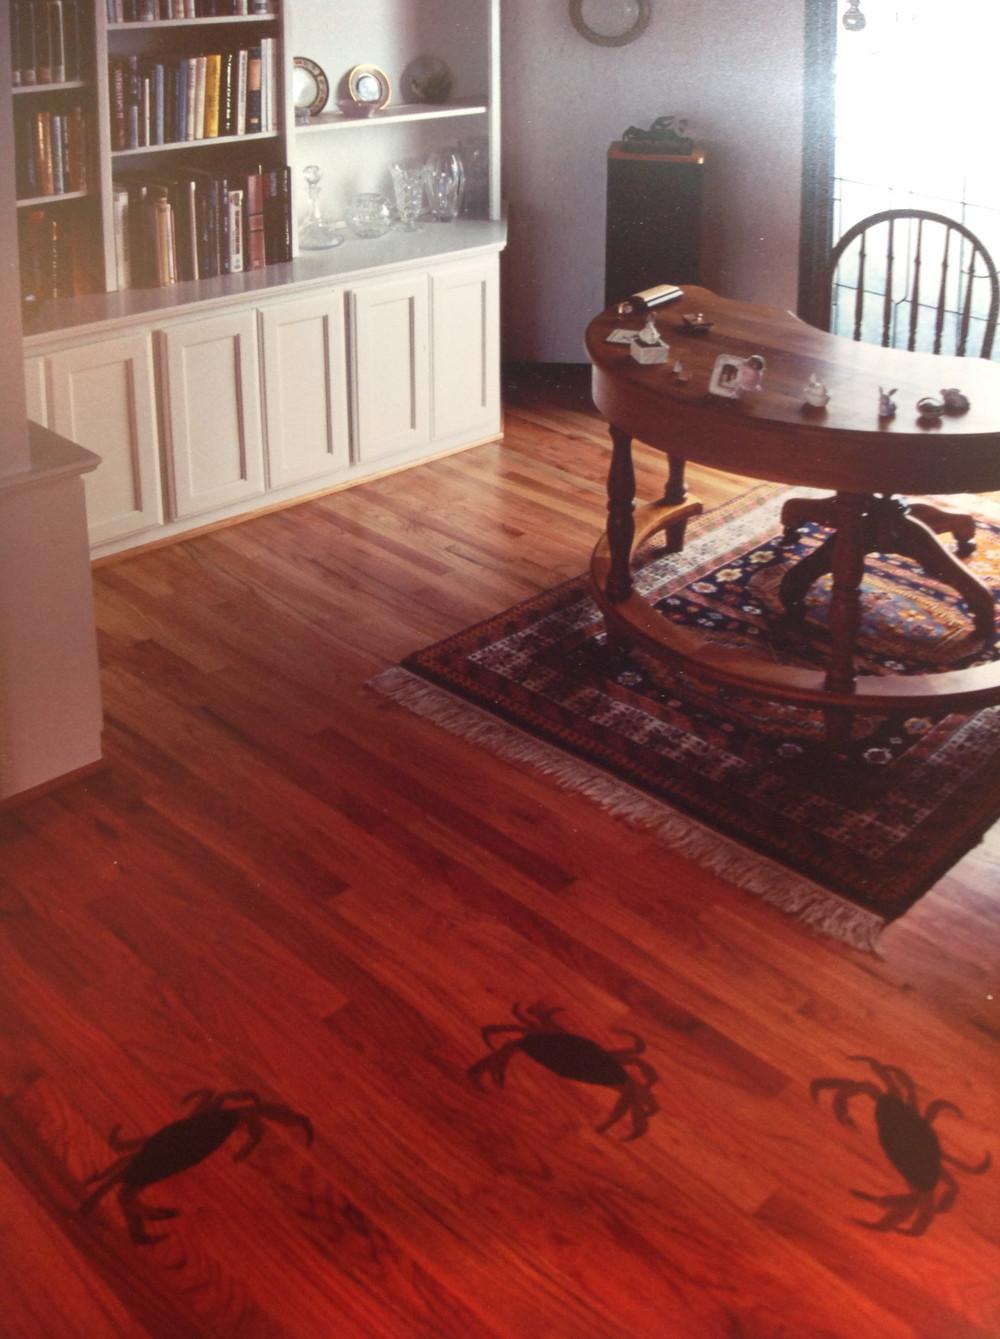 how to start a hardwood flooring business of start to finish hardwood floors llc edmonds wastart to finish intended for start to finish hardwood floors llc edmonds wa